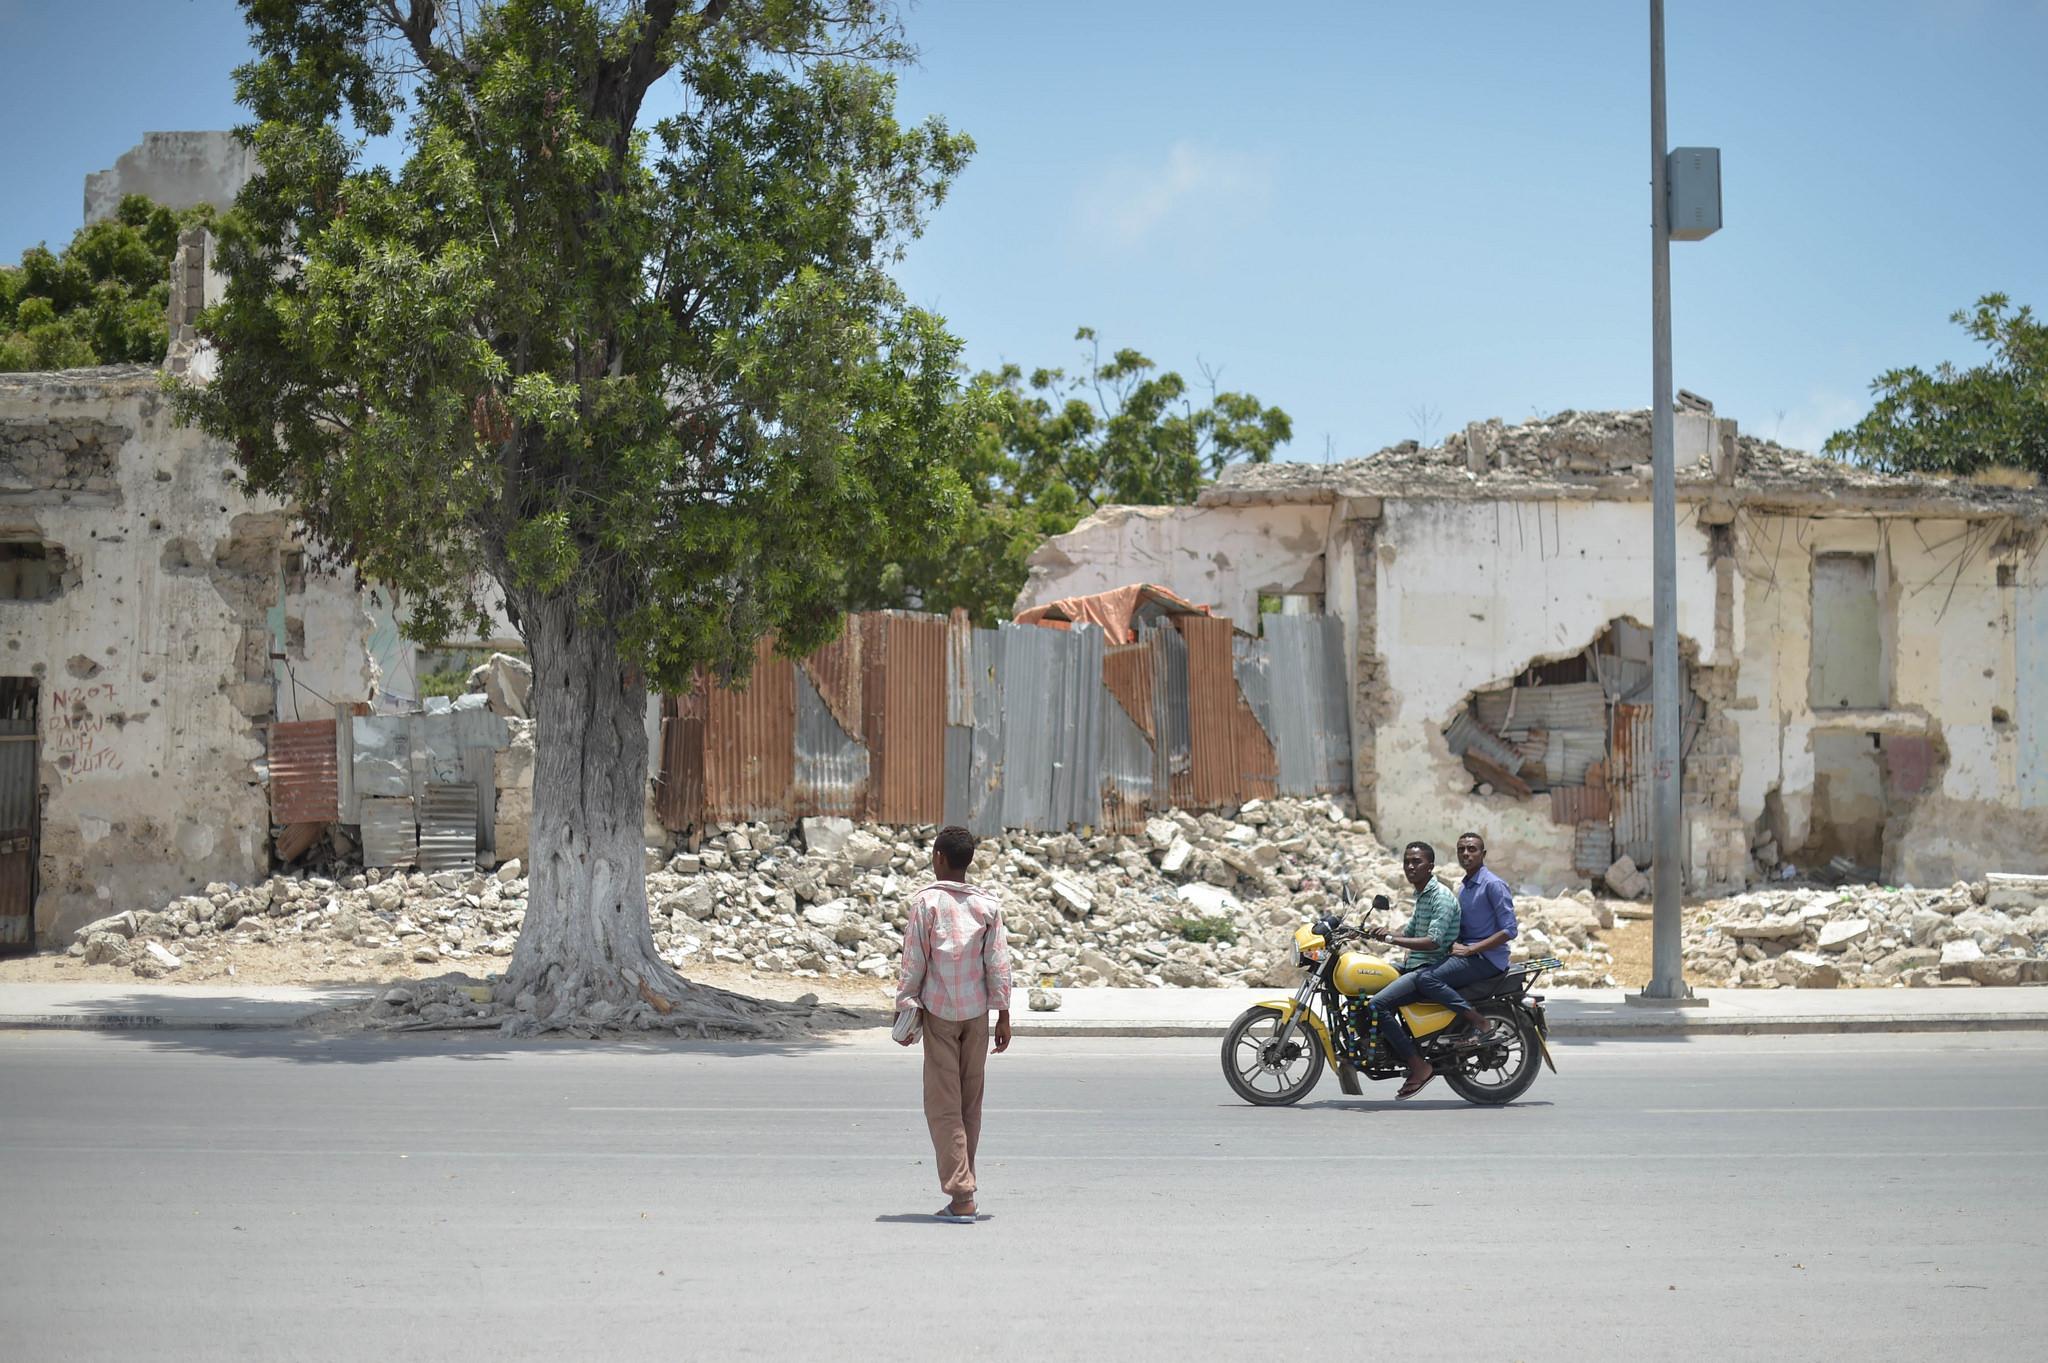 Calles de Mogadiscio, capital de Somalia. Foto: AMISOM